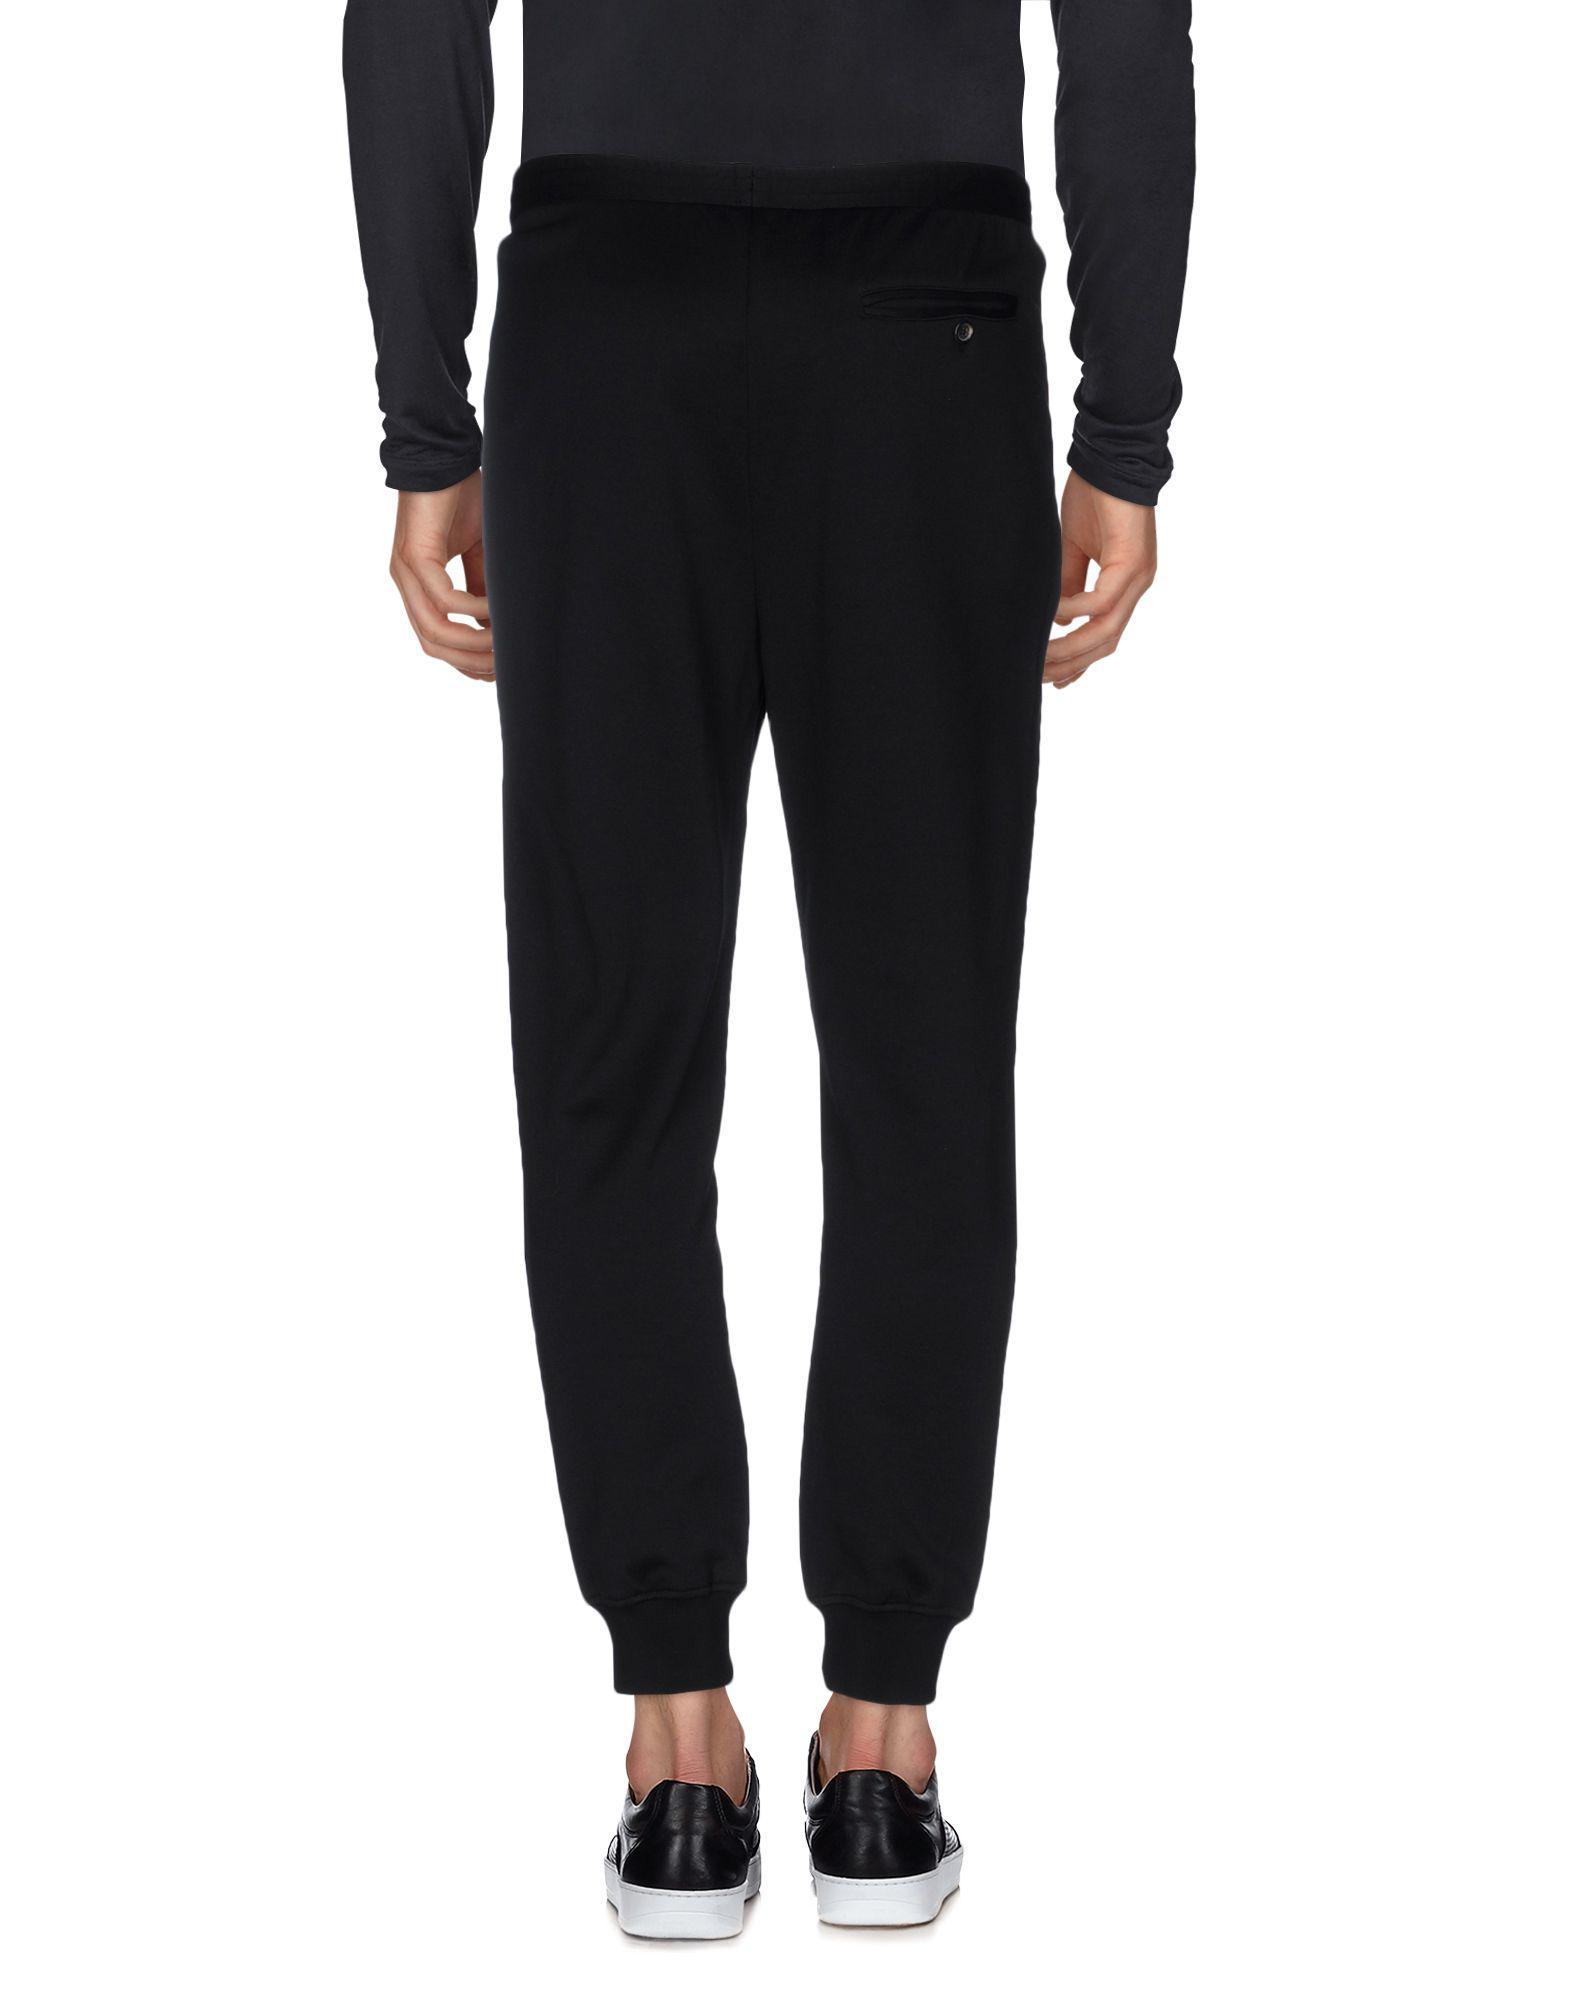 DSquared² Fleece Casual Pants in Black for Men